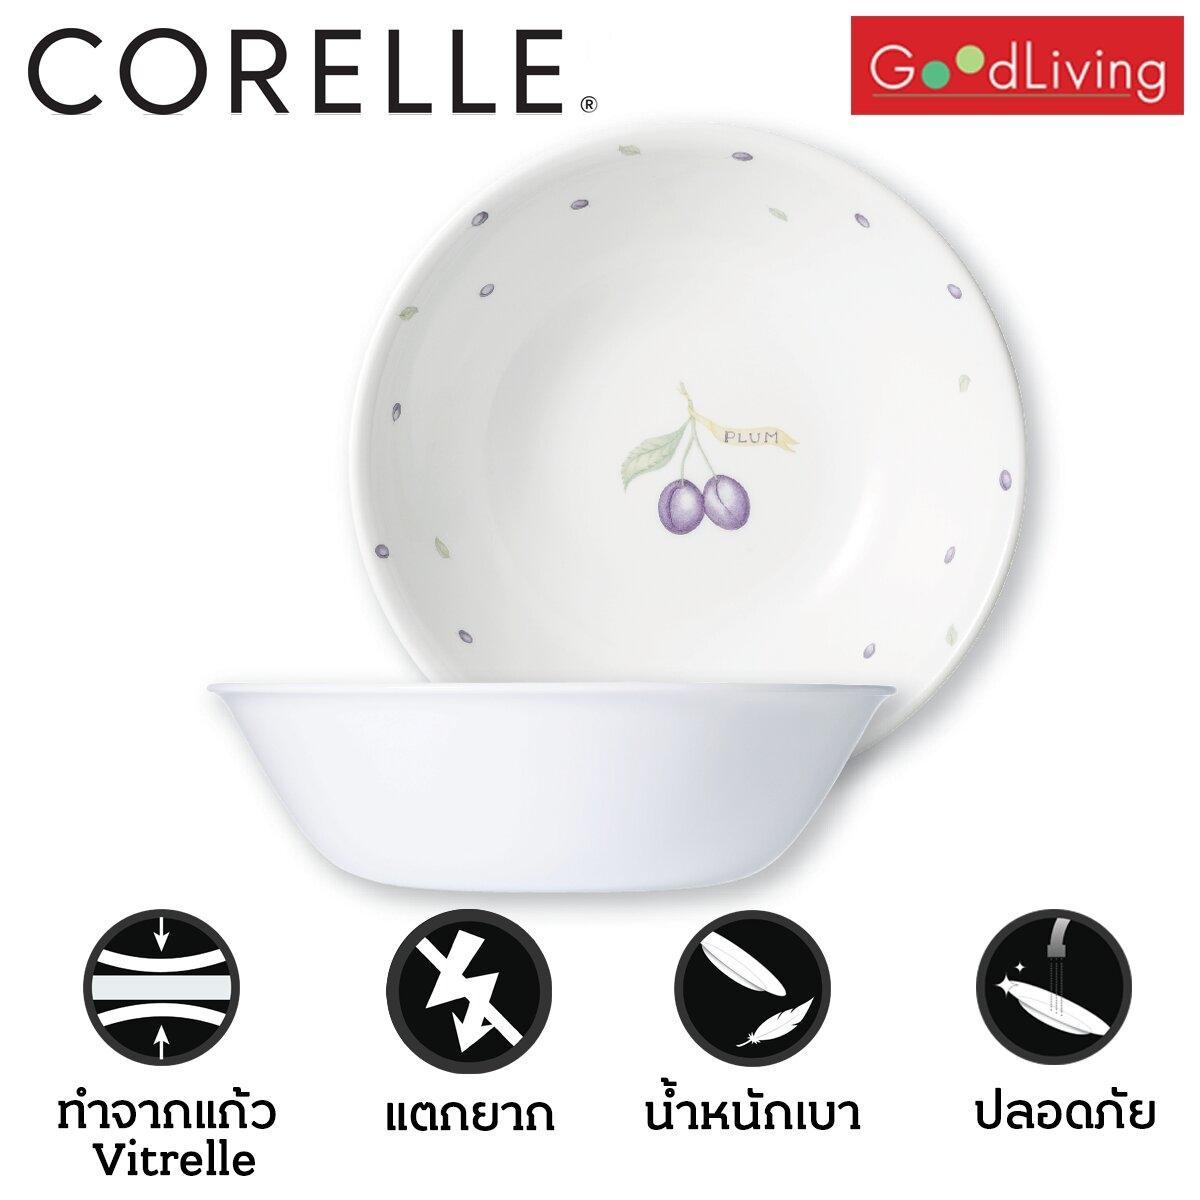 Corelle ชามใส่อาหารสีม่วง ขนาด 8.5 นิ้ว (21.5 ซม.) 2 ชิ้น/C-03-432-PU-2